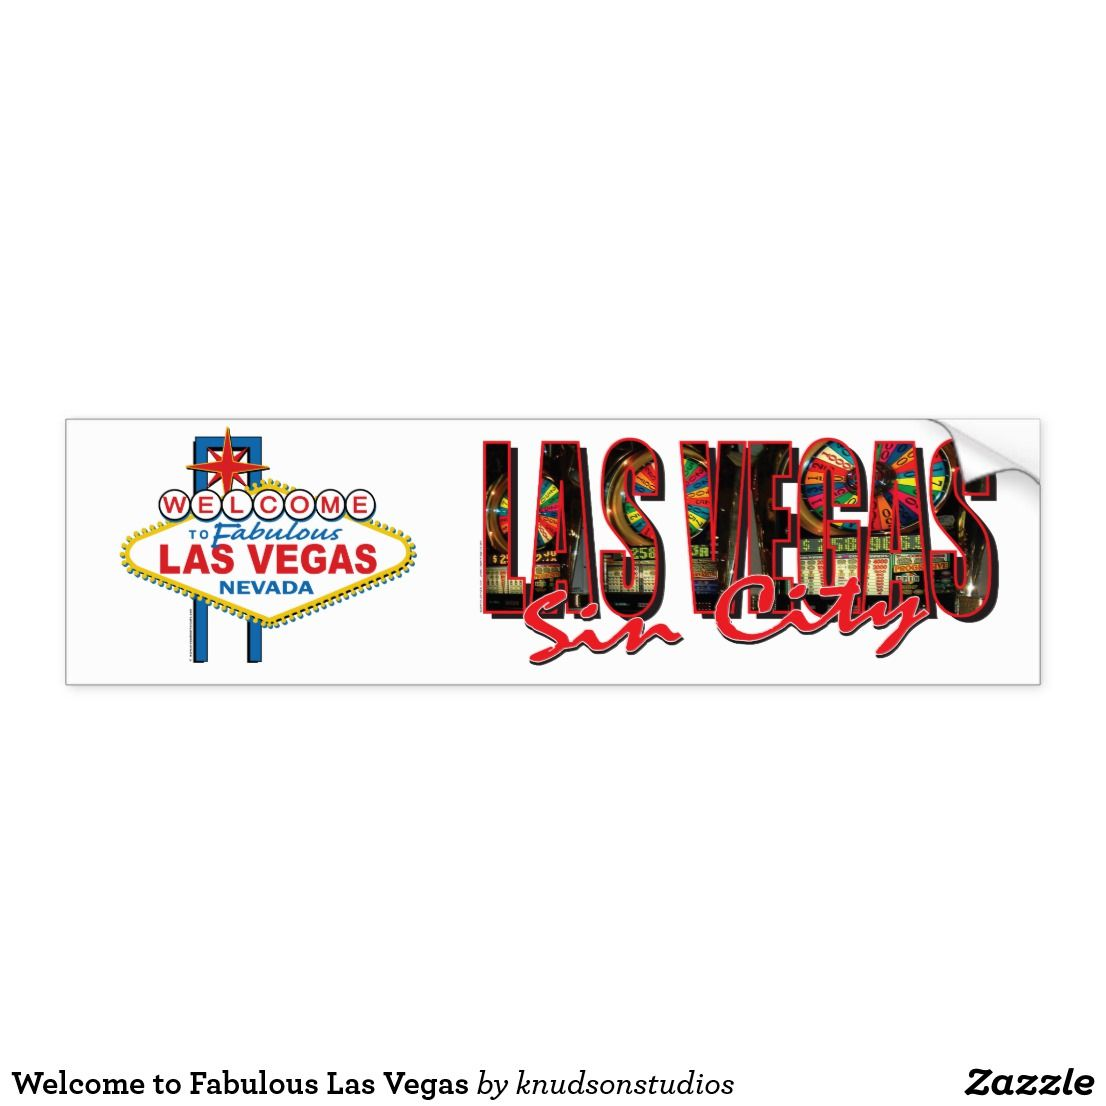 Welcome To Fabulous Las Vegas Bumper Sticker Zazzle Com Bumper Stickers Las Vegas Strong Adhesive [ 1106 x 1106 Pixel ]